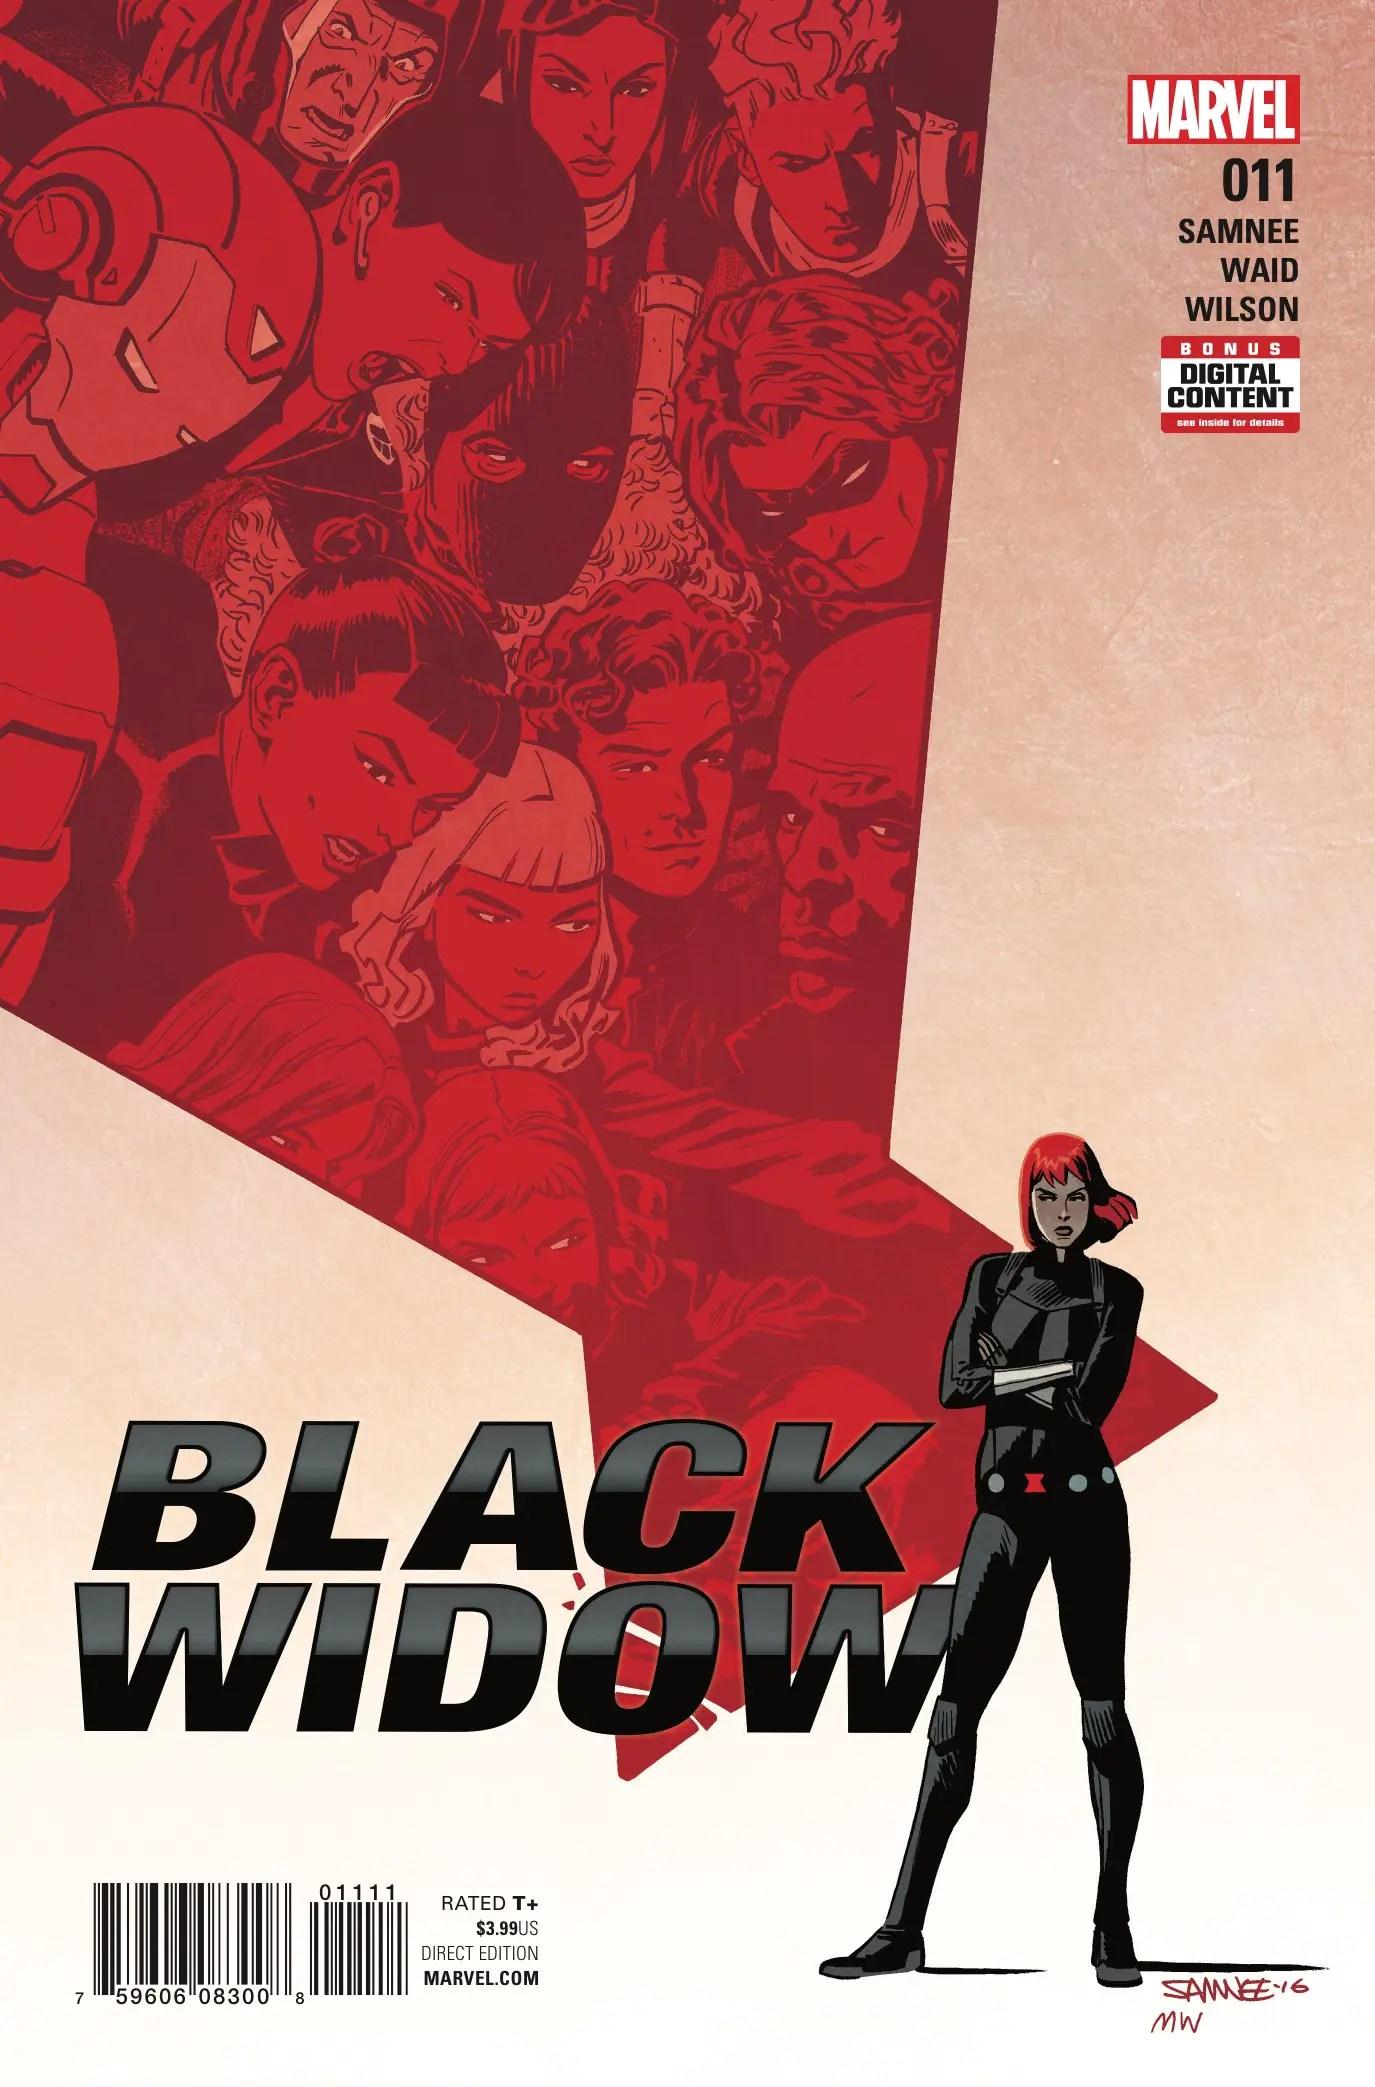 Black Widow #11 Review